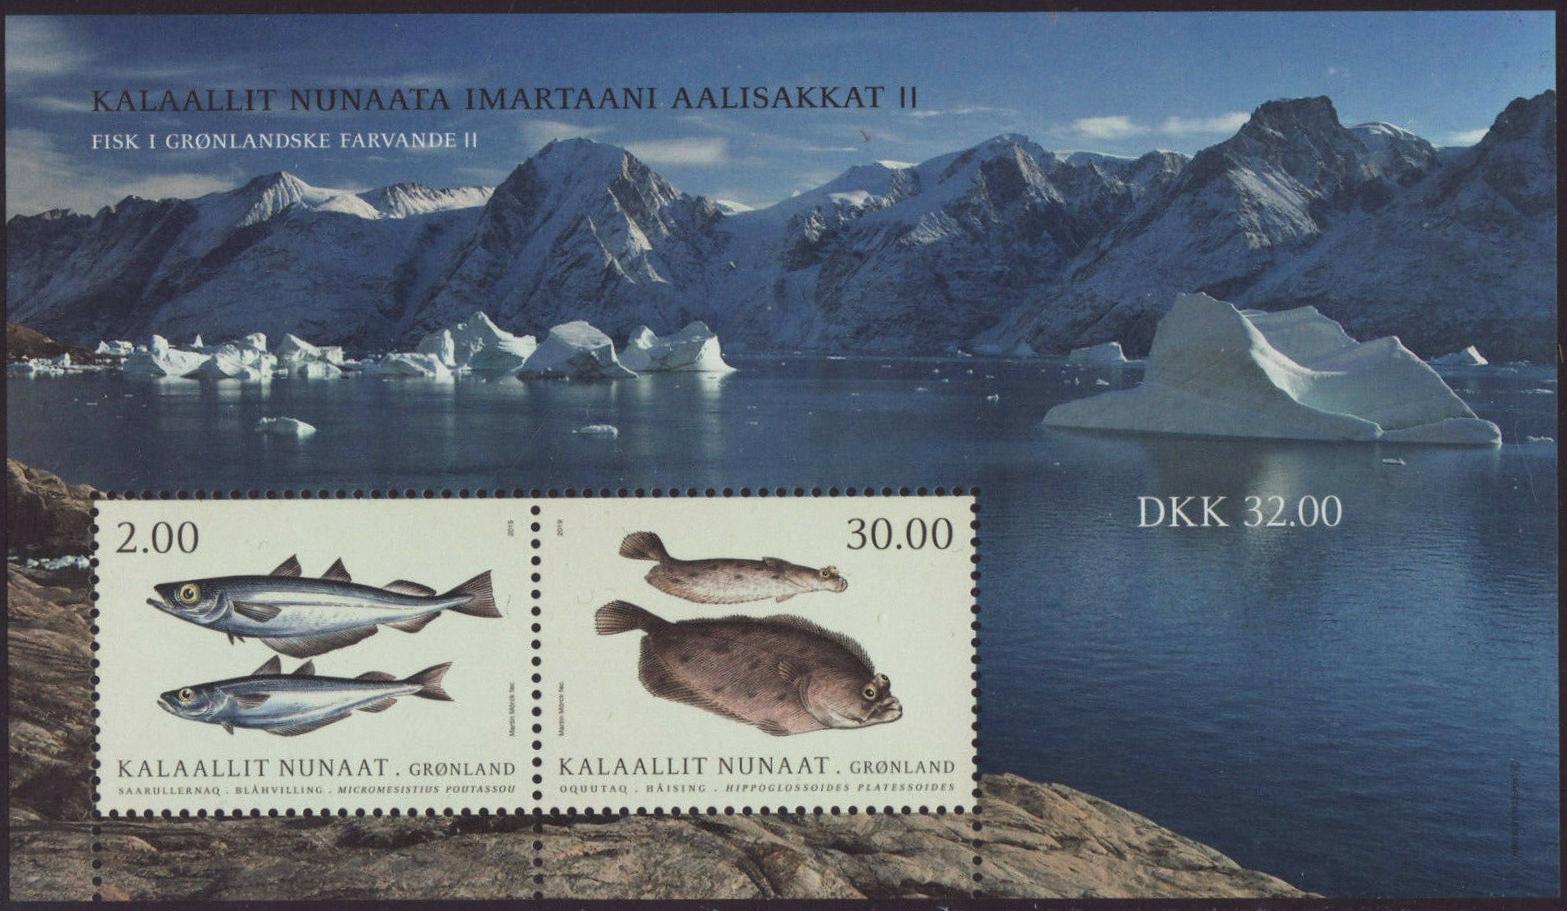 Greenland - Fish in Greenlandic Waters, Part II (January 21, 2019) miniature sheet of 2